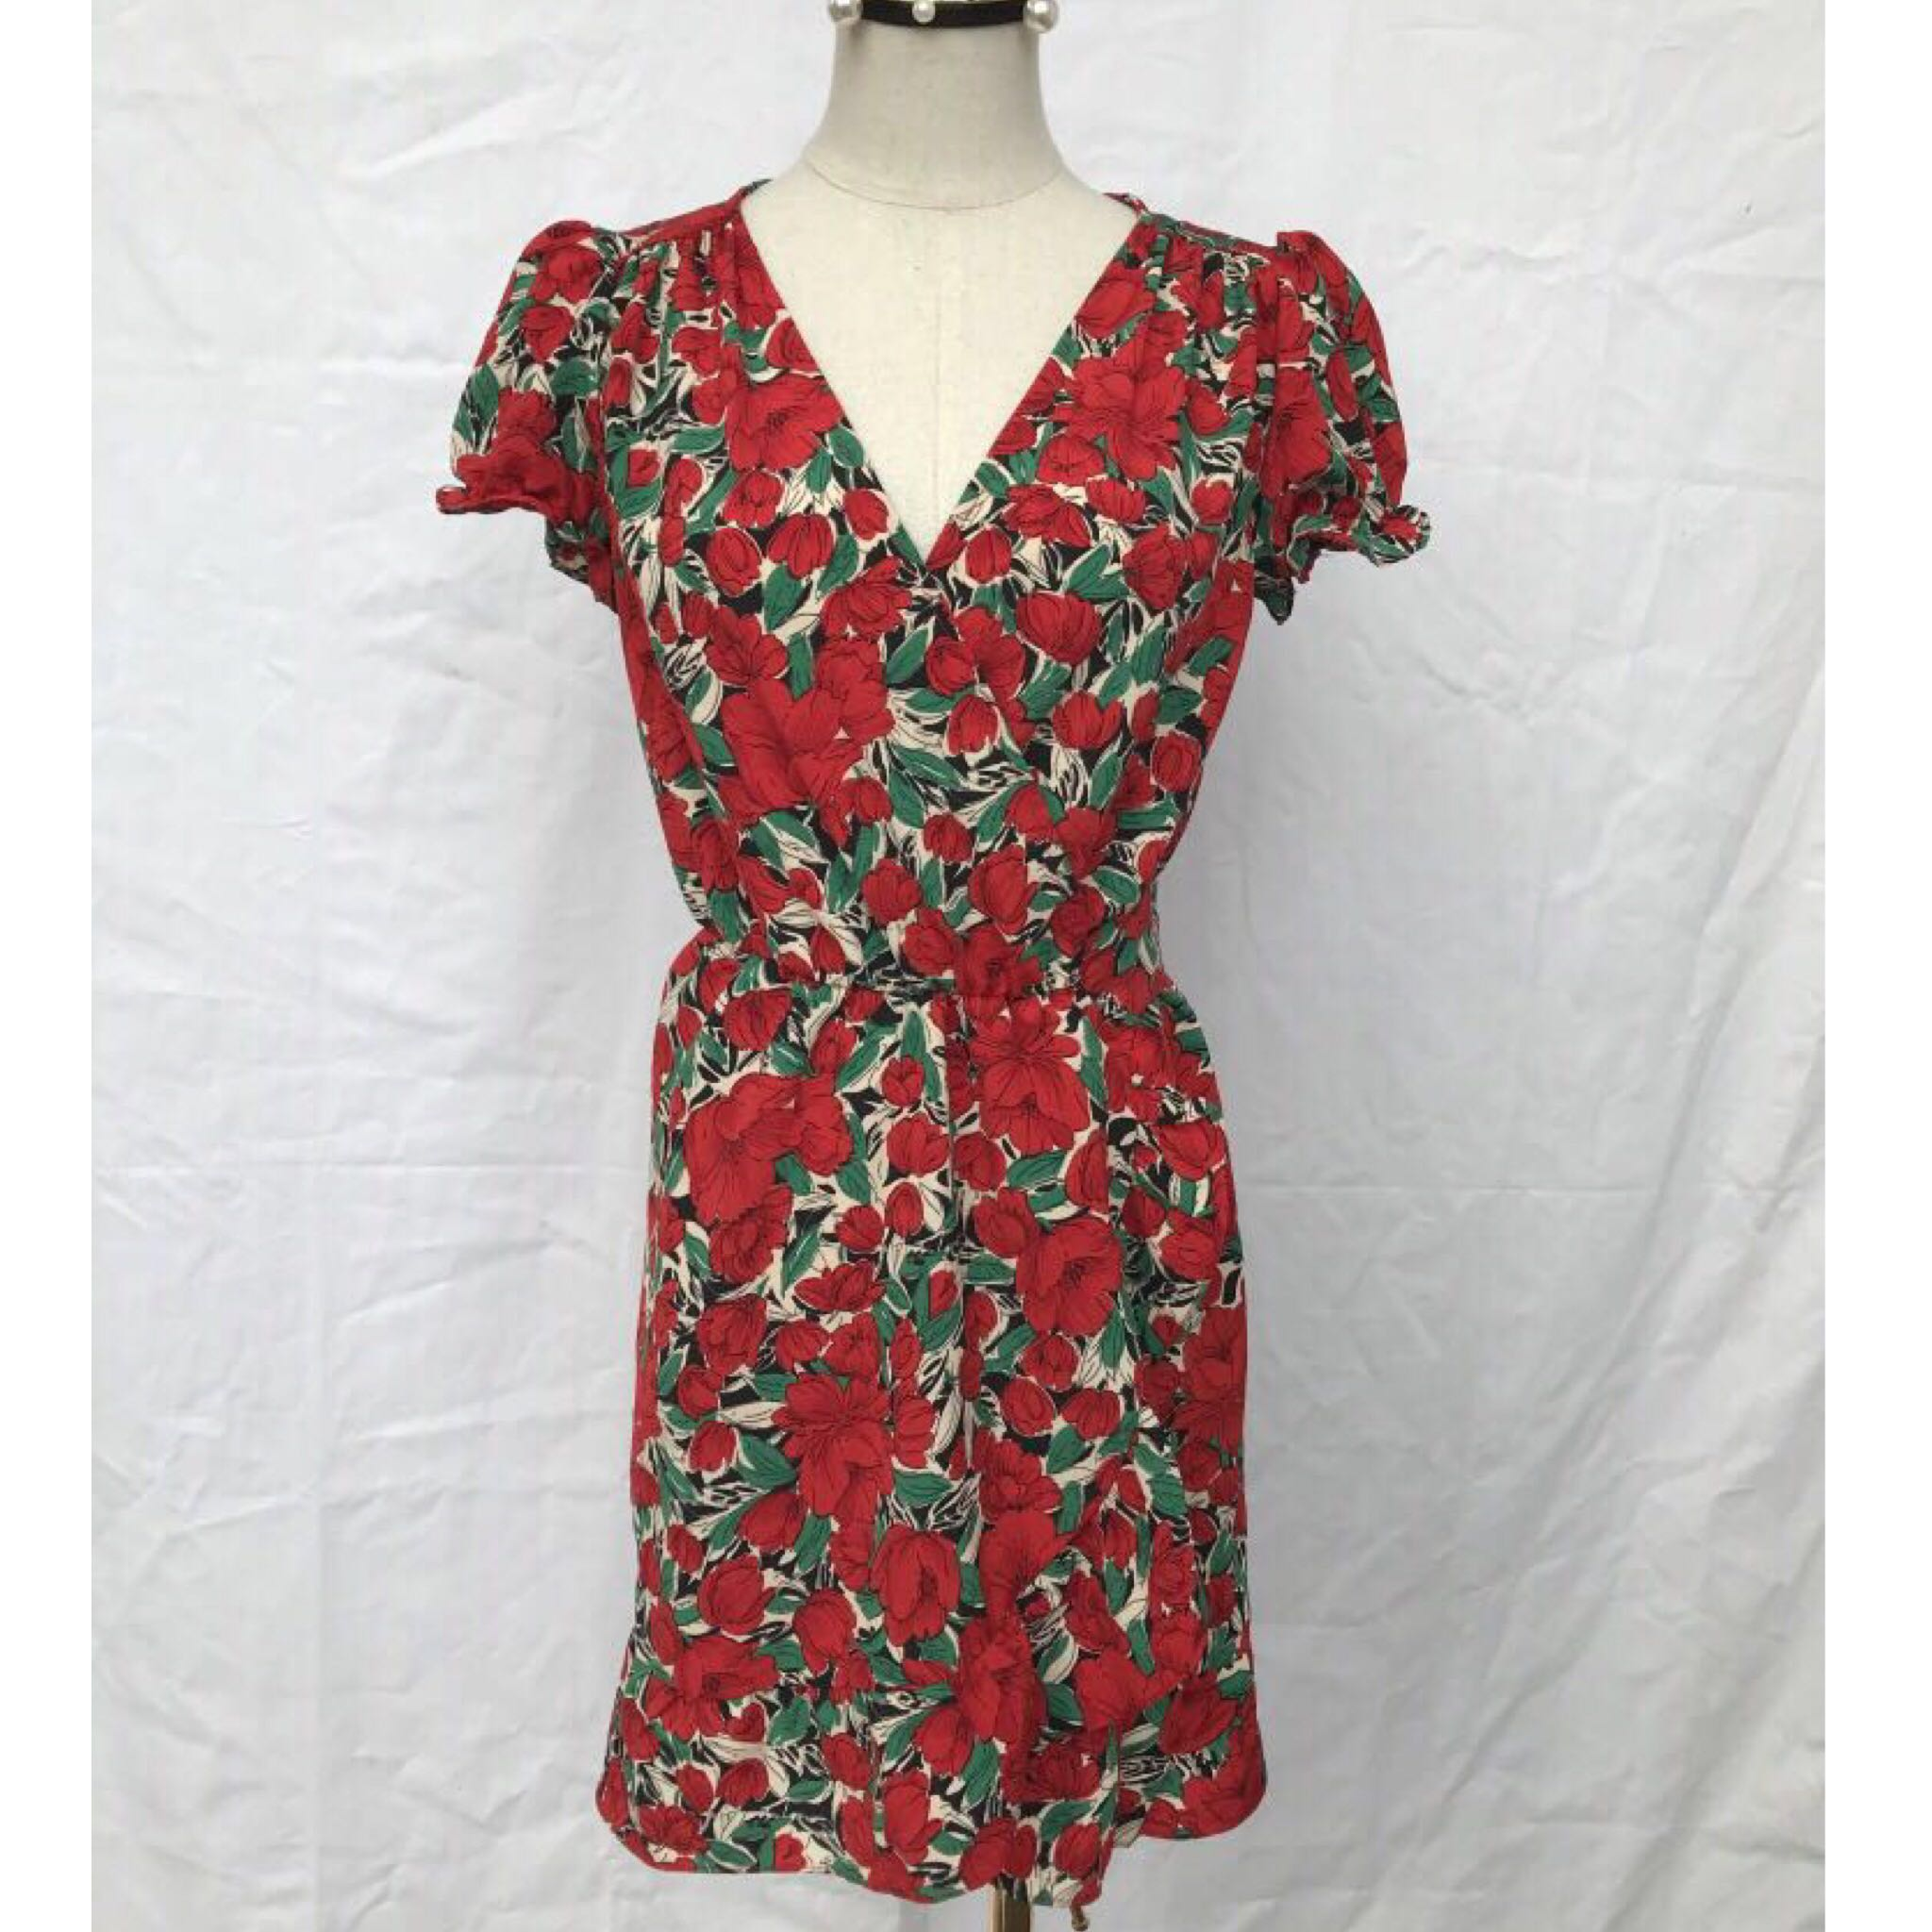 5d08fdf22e5 Zara Crossover Dress With Pockets - Gomes Weine AG